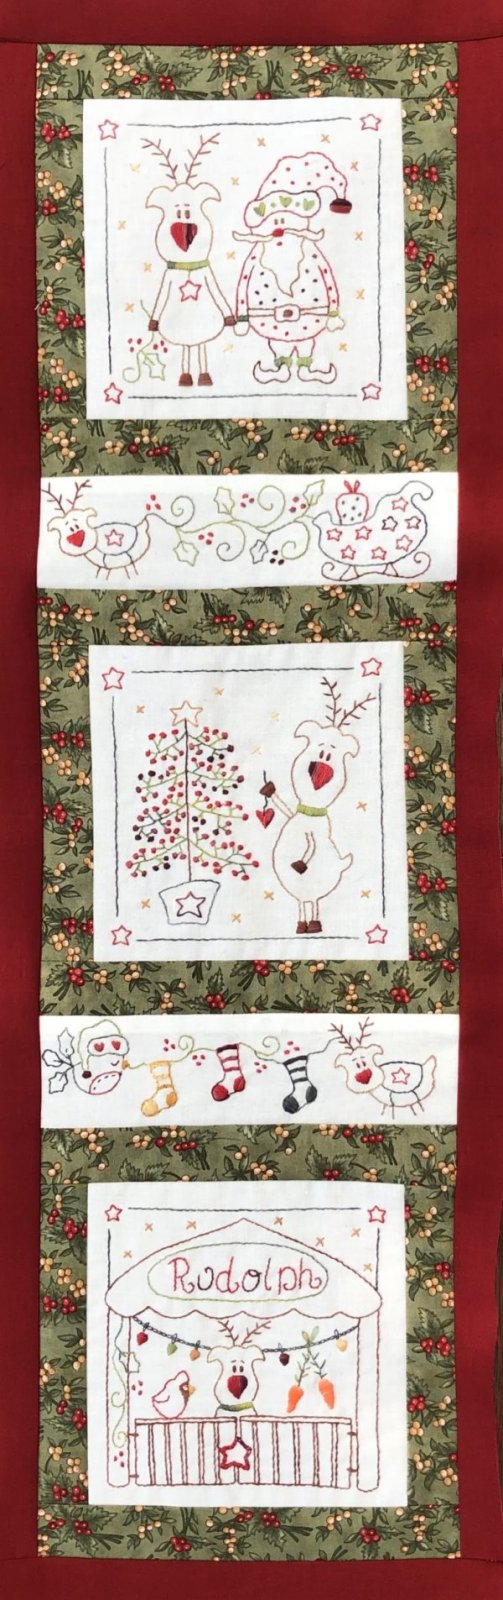 Rudolphs Day